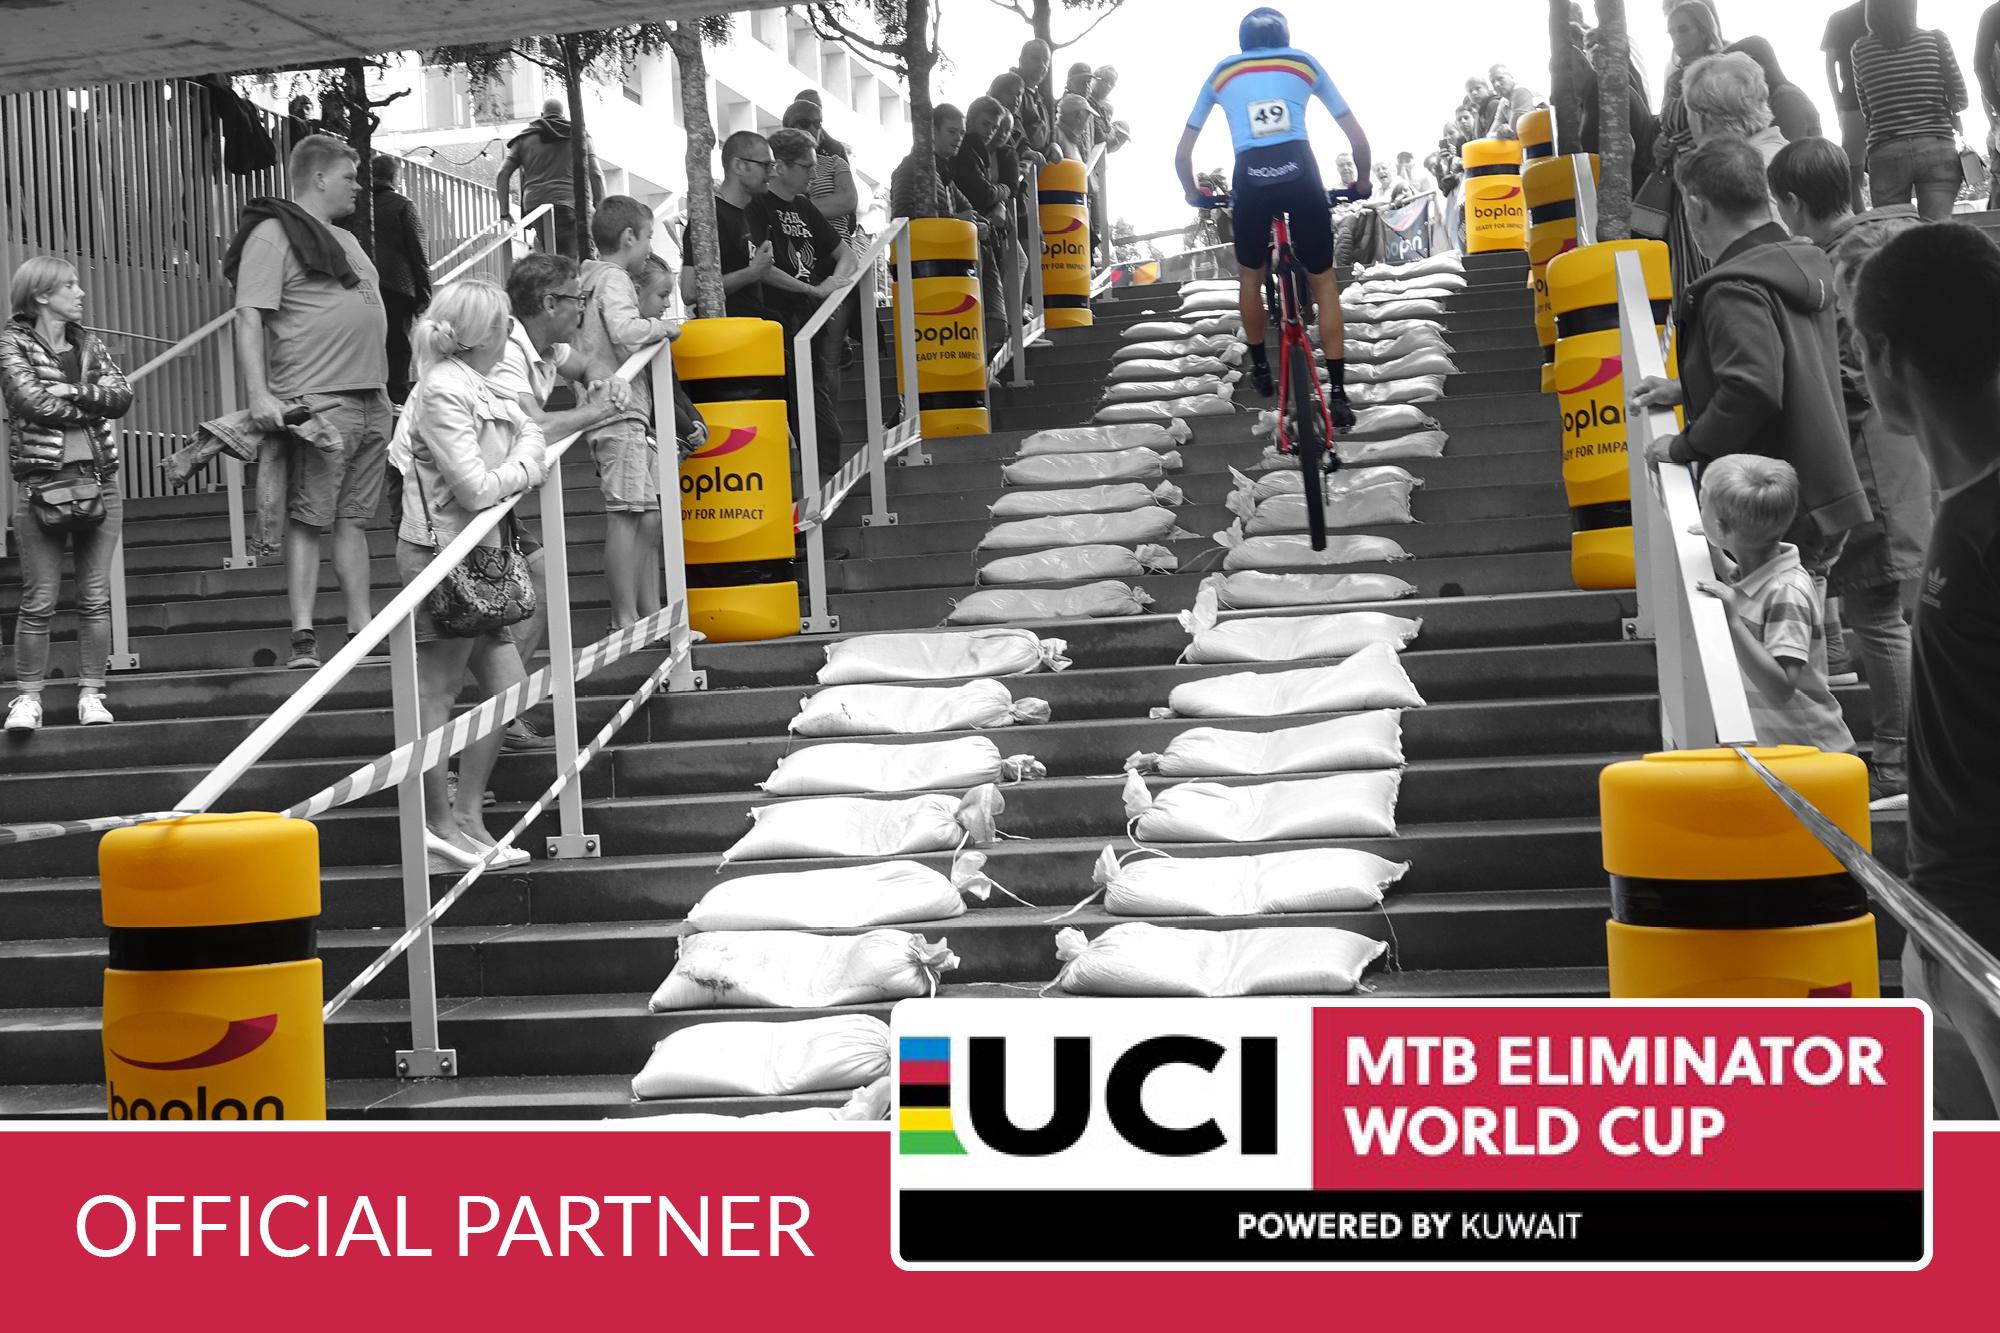 boplan-official-partner-uci-mountain-bike-eliminator-world-cup